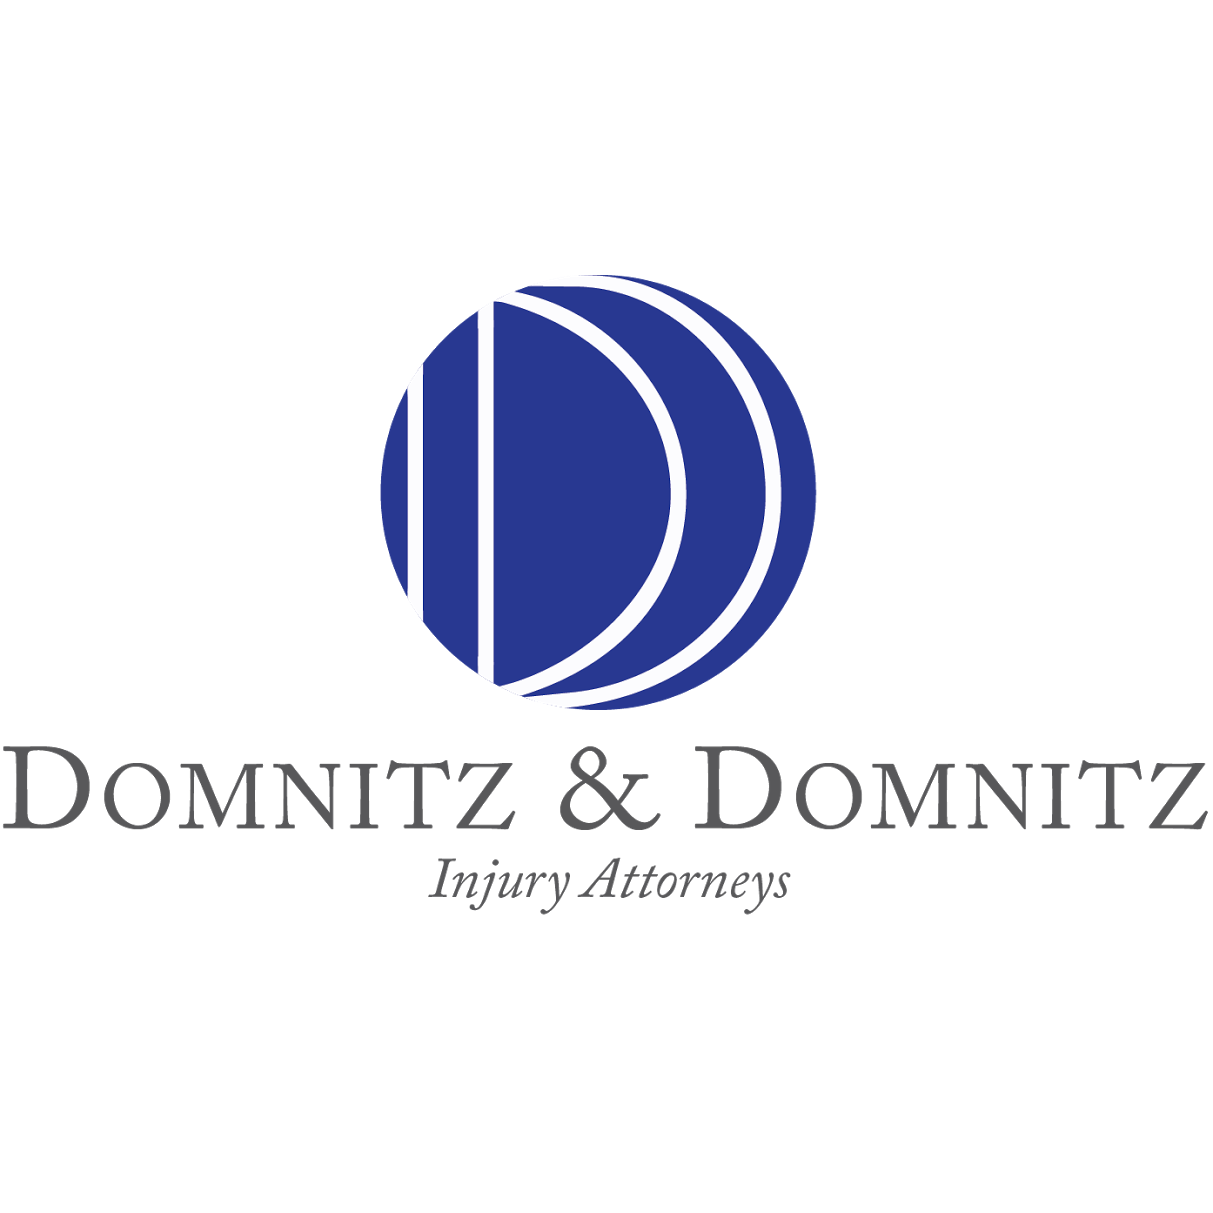 Domnitz & Domnitz, S.C.